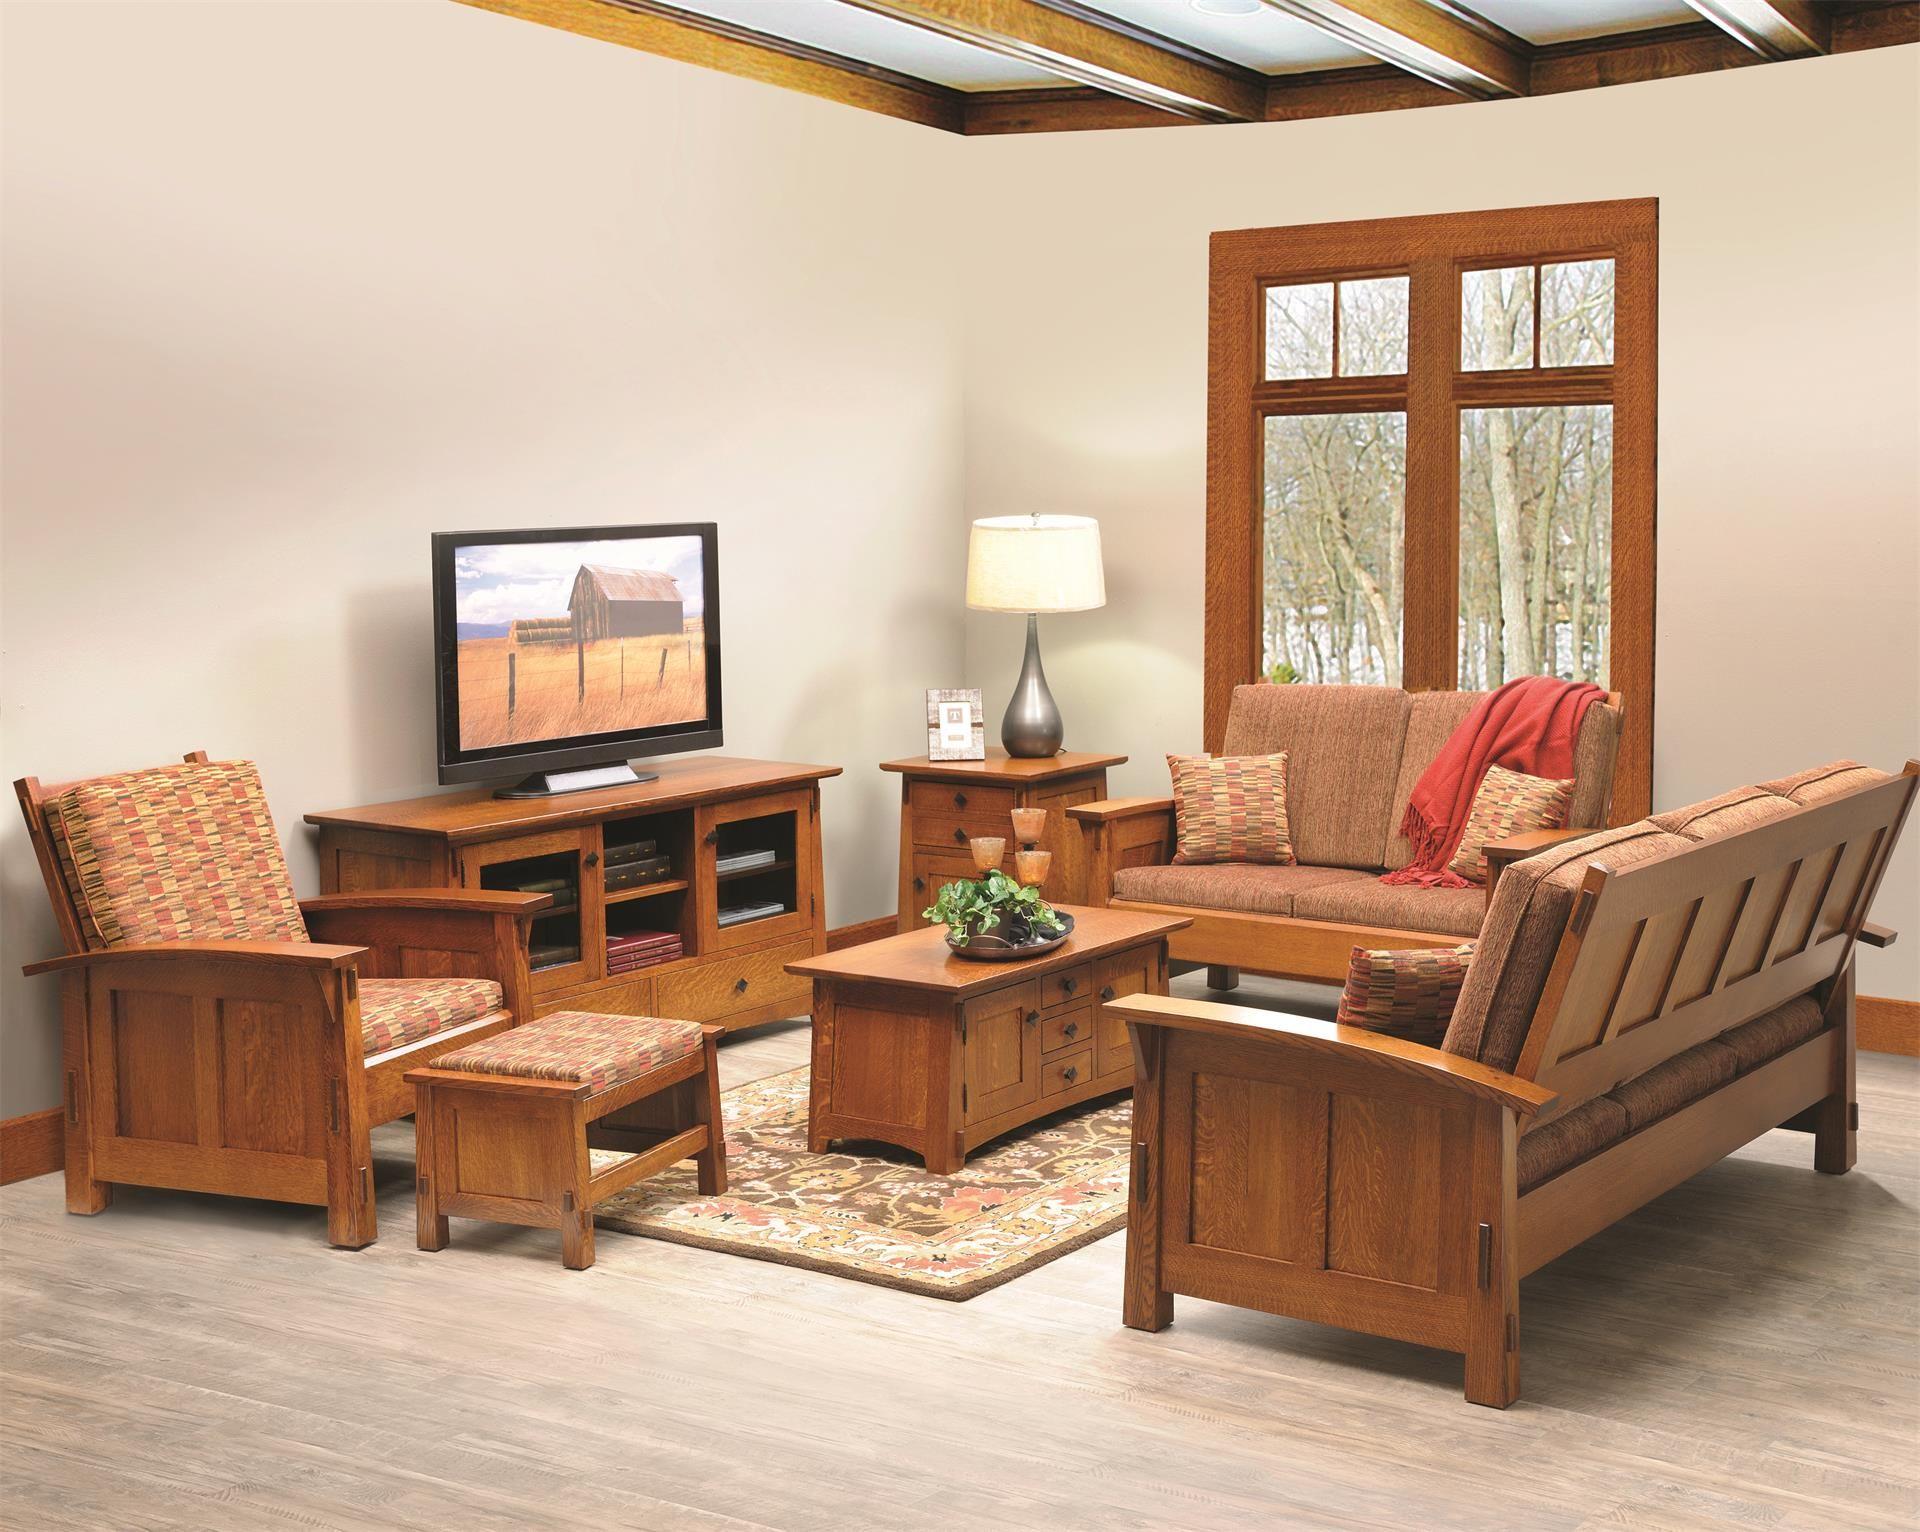 Live A Little Or A Lot In Our Goshen Shaker Living Room Set